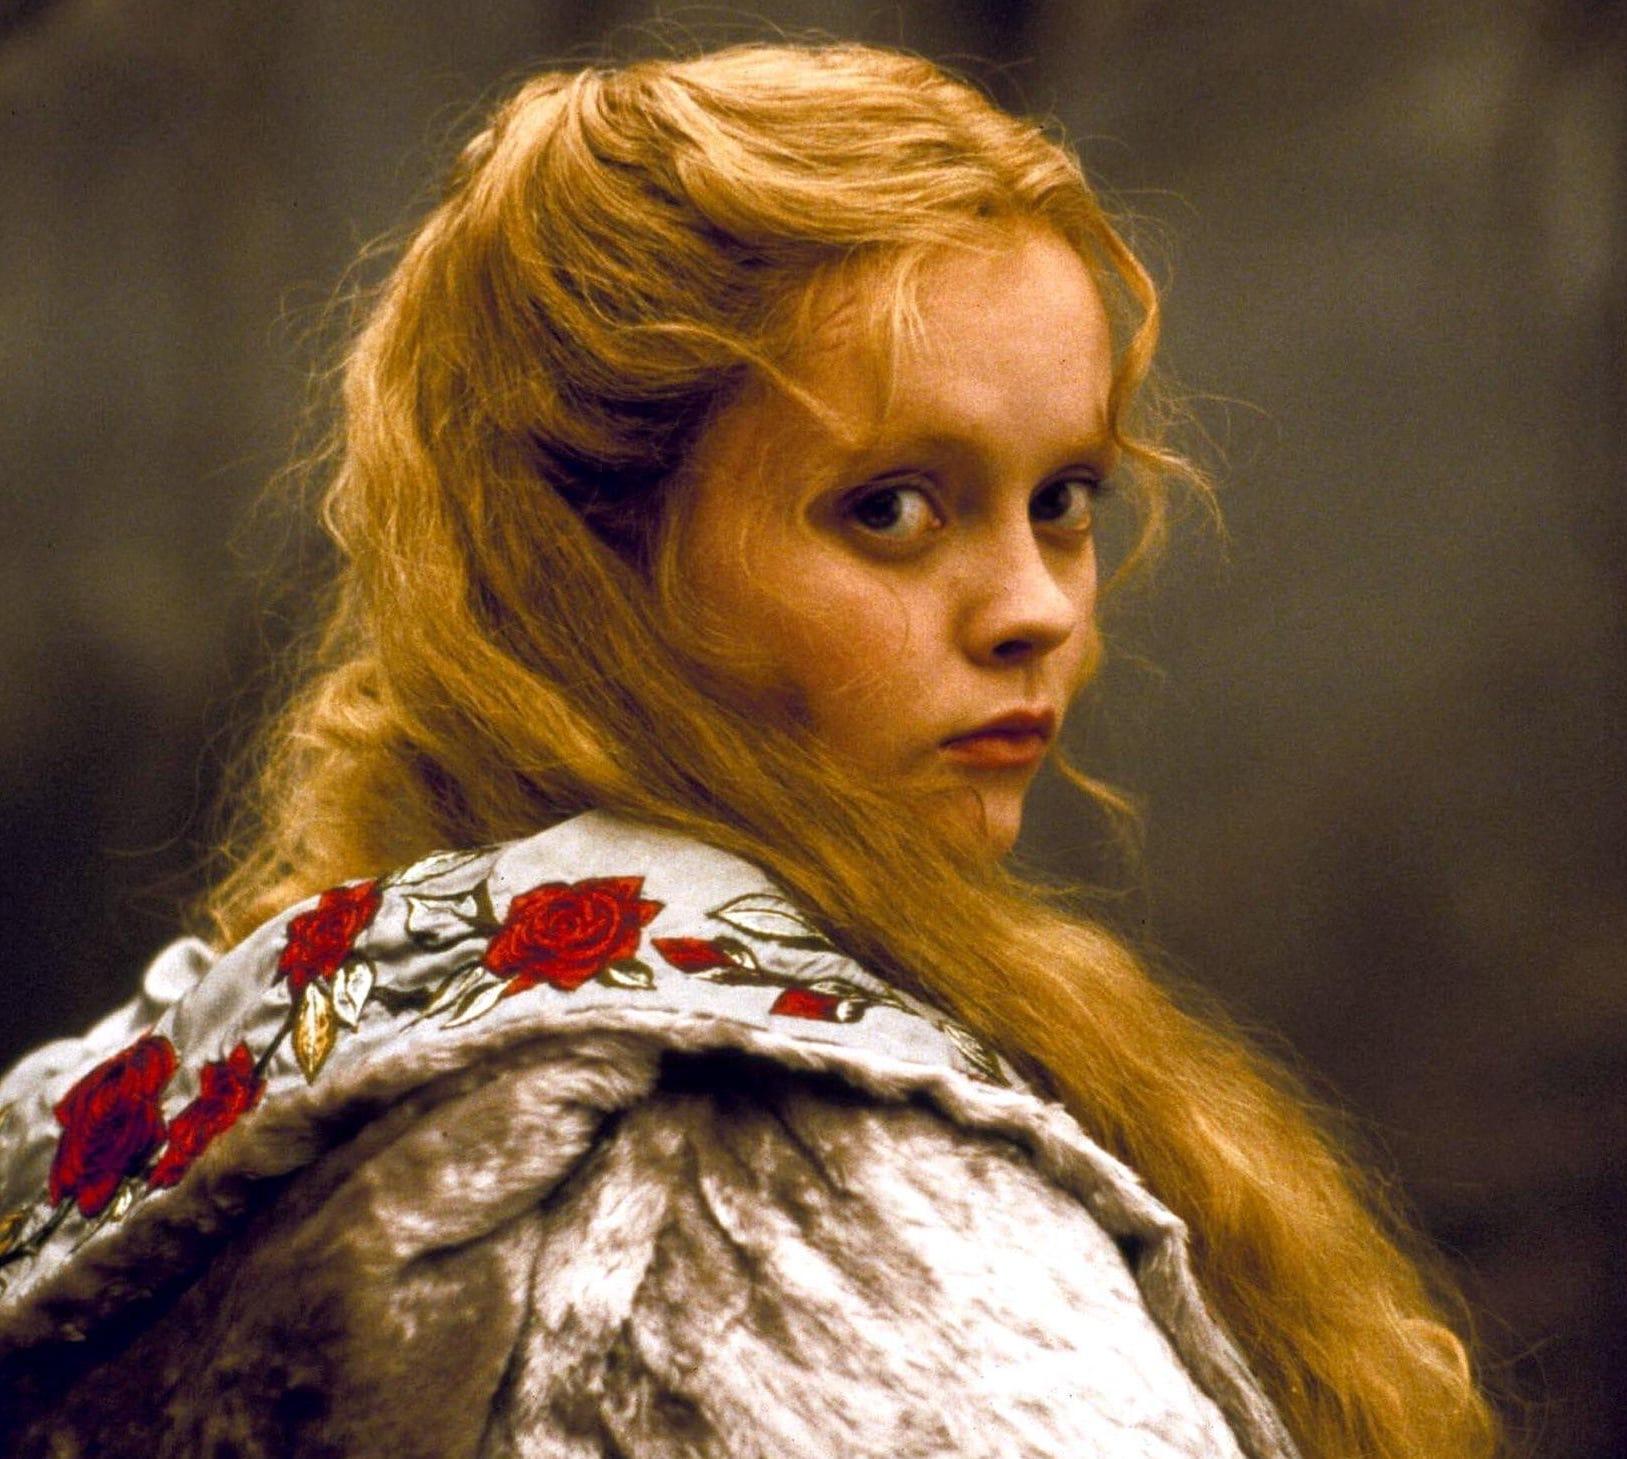 Christina Ricci as Katrina Van Tassel in Sleepy Hollow (1999)